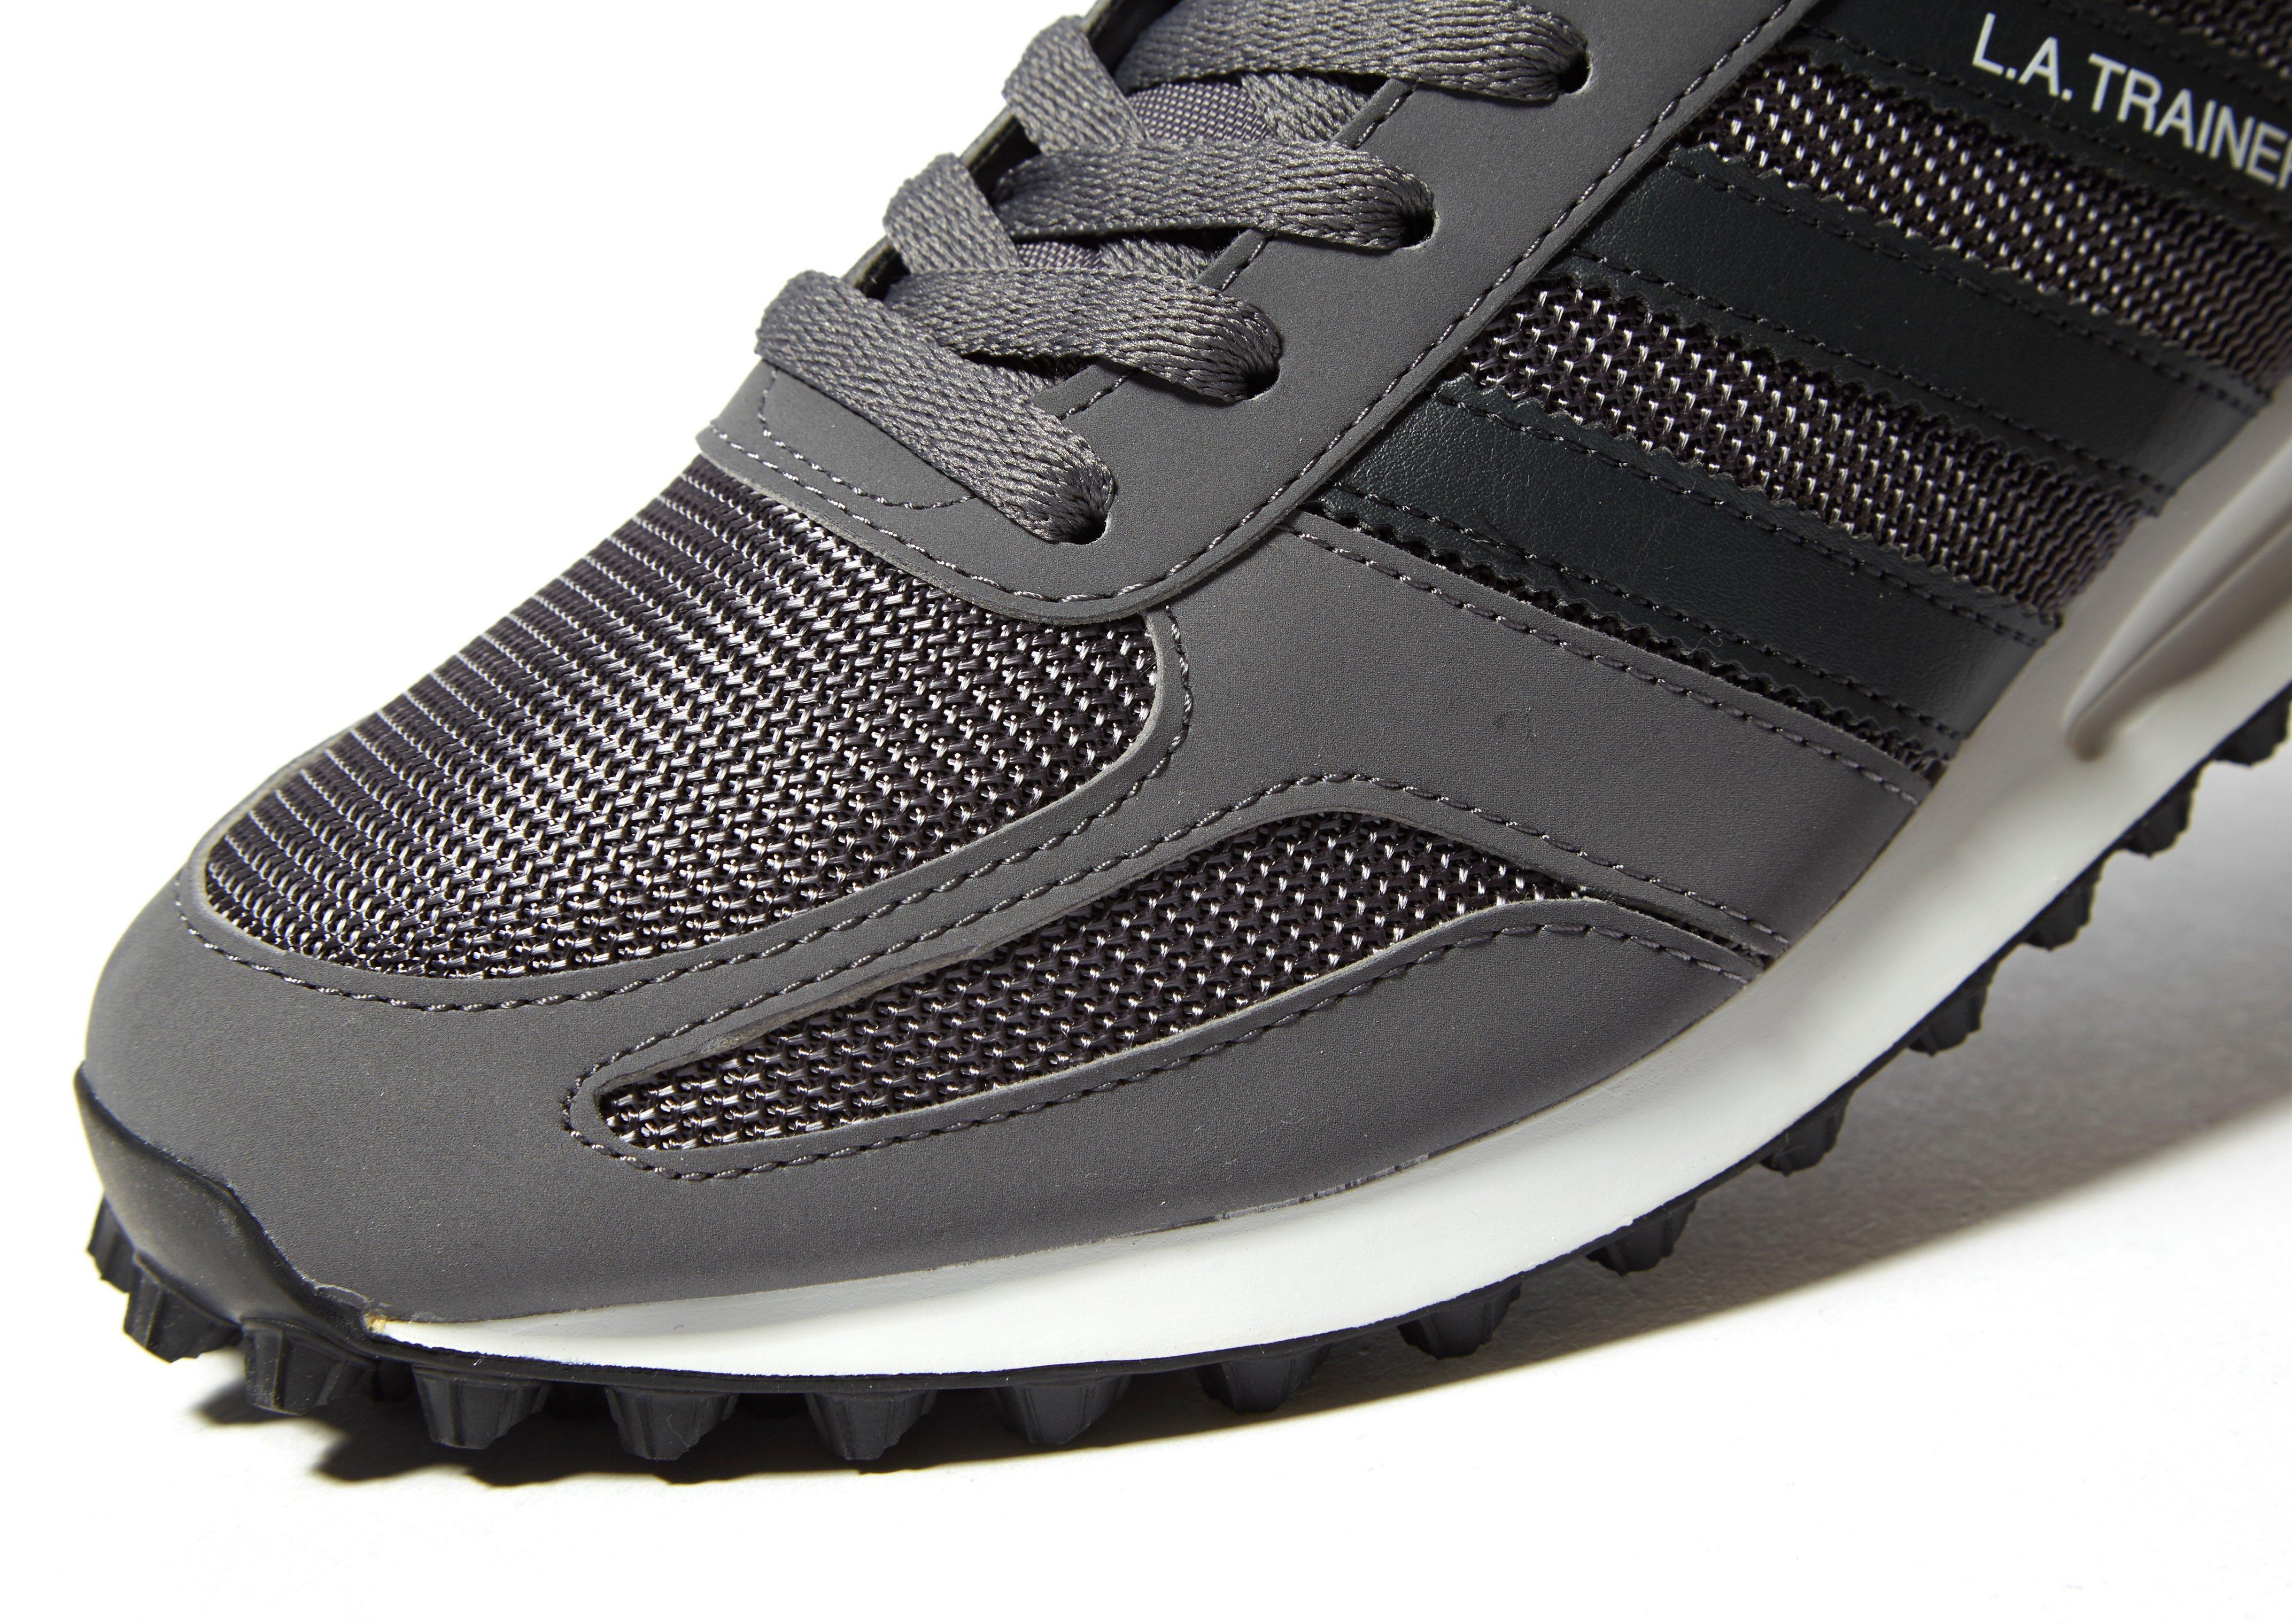 Lyst adidas Originals LA Trainer en gris para hombres salvar 8%